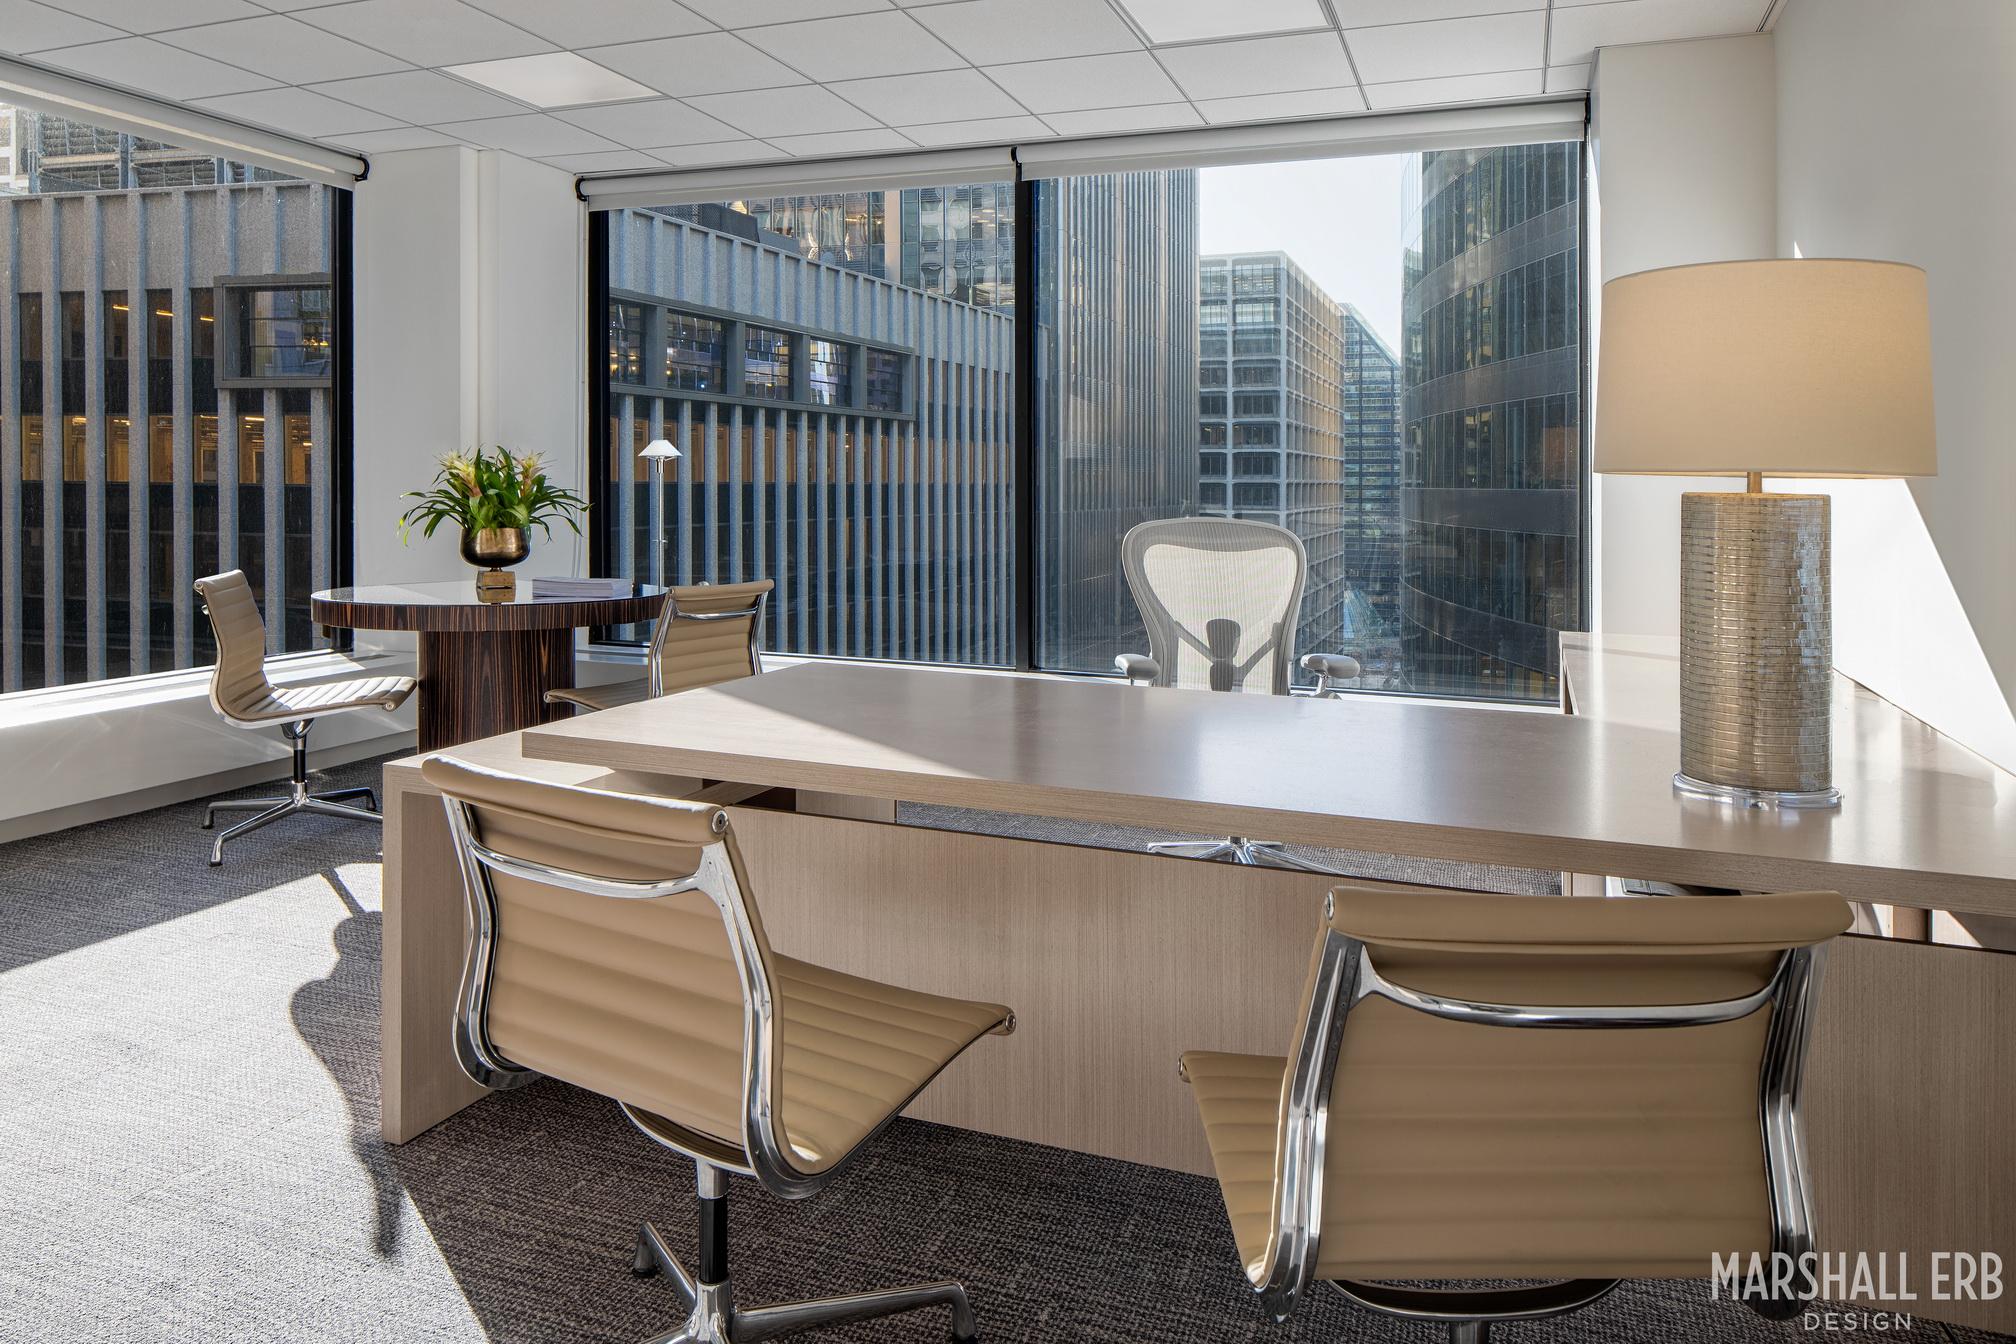 Marshall_Erb_Design_Sweeney_Scharkey_Blanchard_ASID_Award_Winning_Office_10